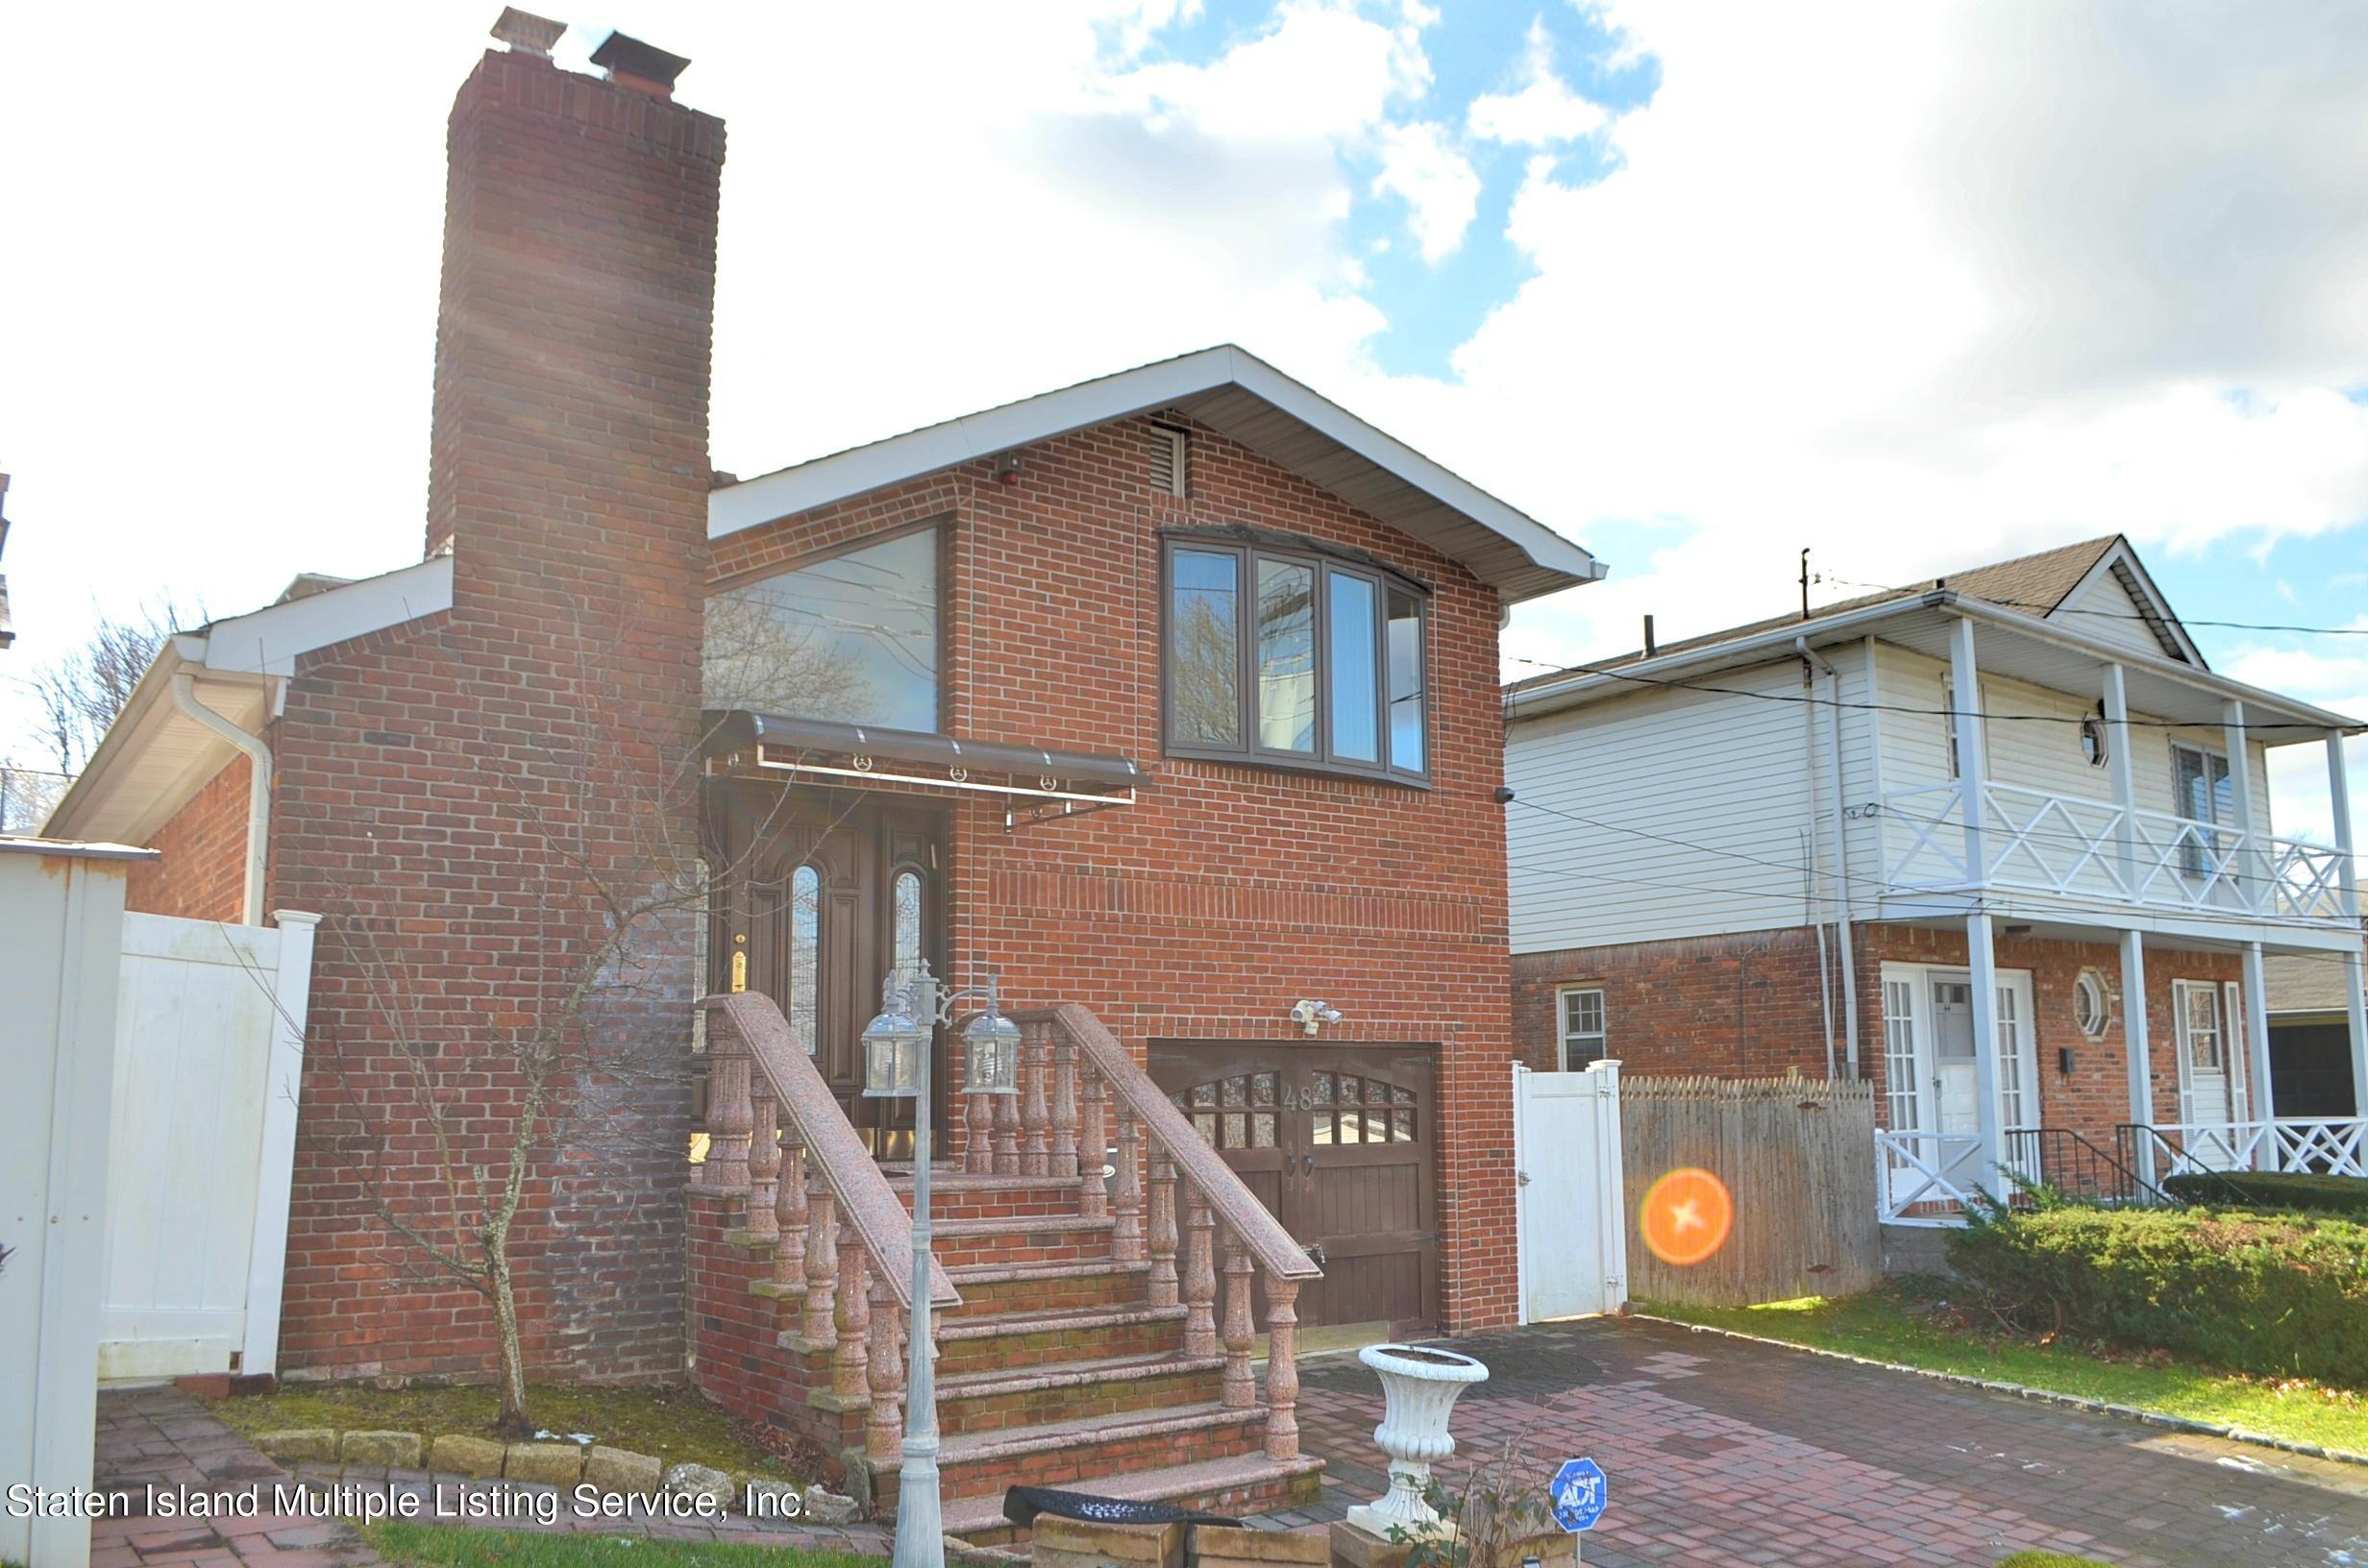 Single Family - Detached 48 Ocean Terrace  Staten Island, NY 10314, MLS-1142240-3